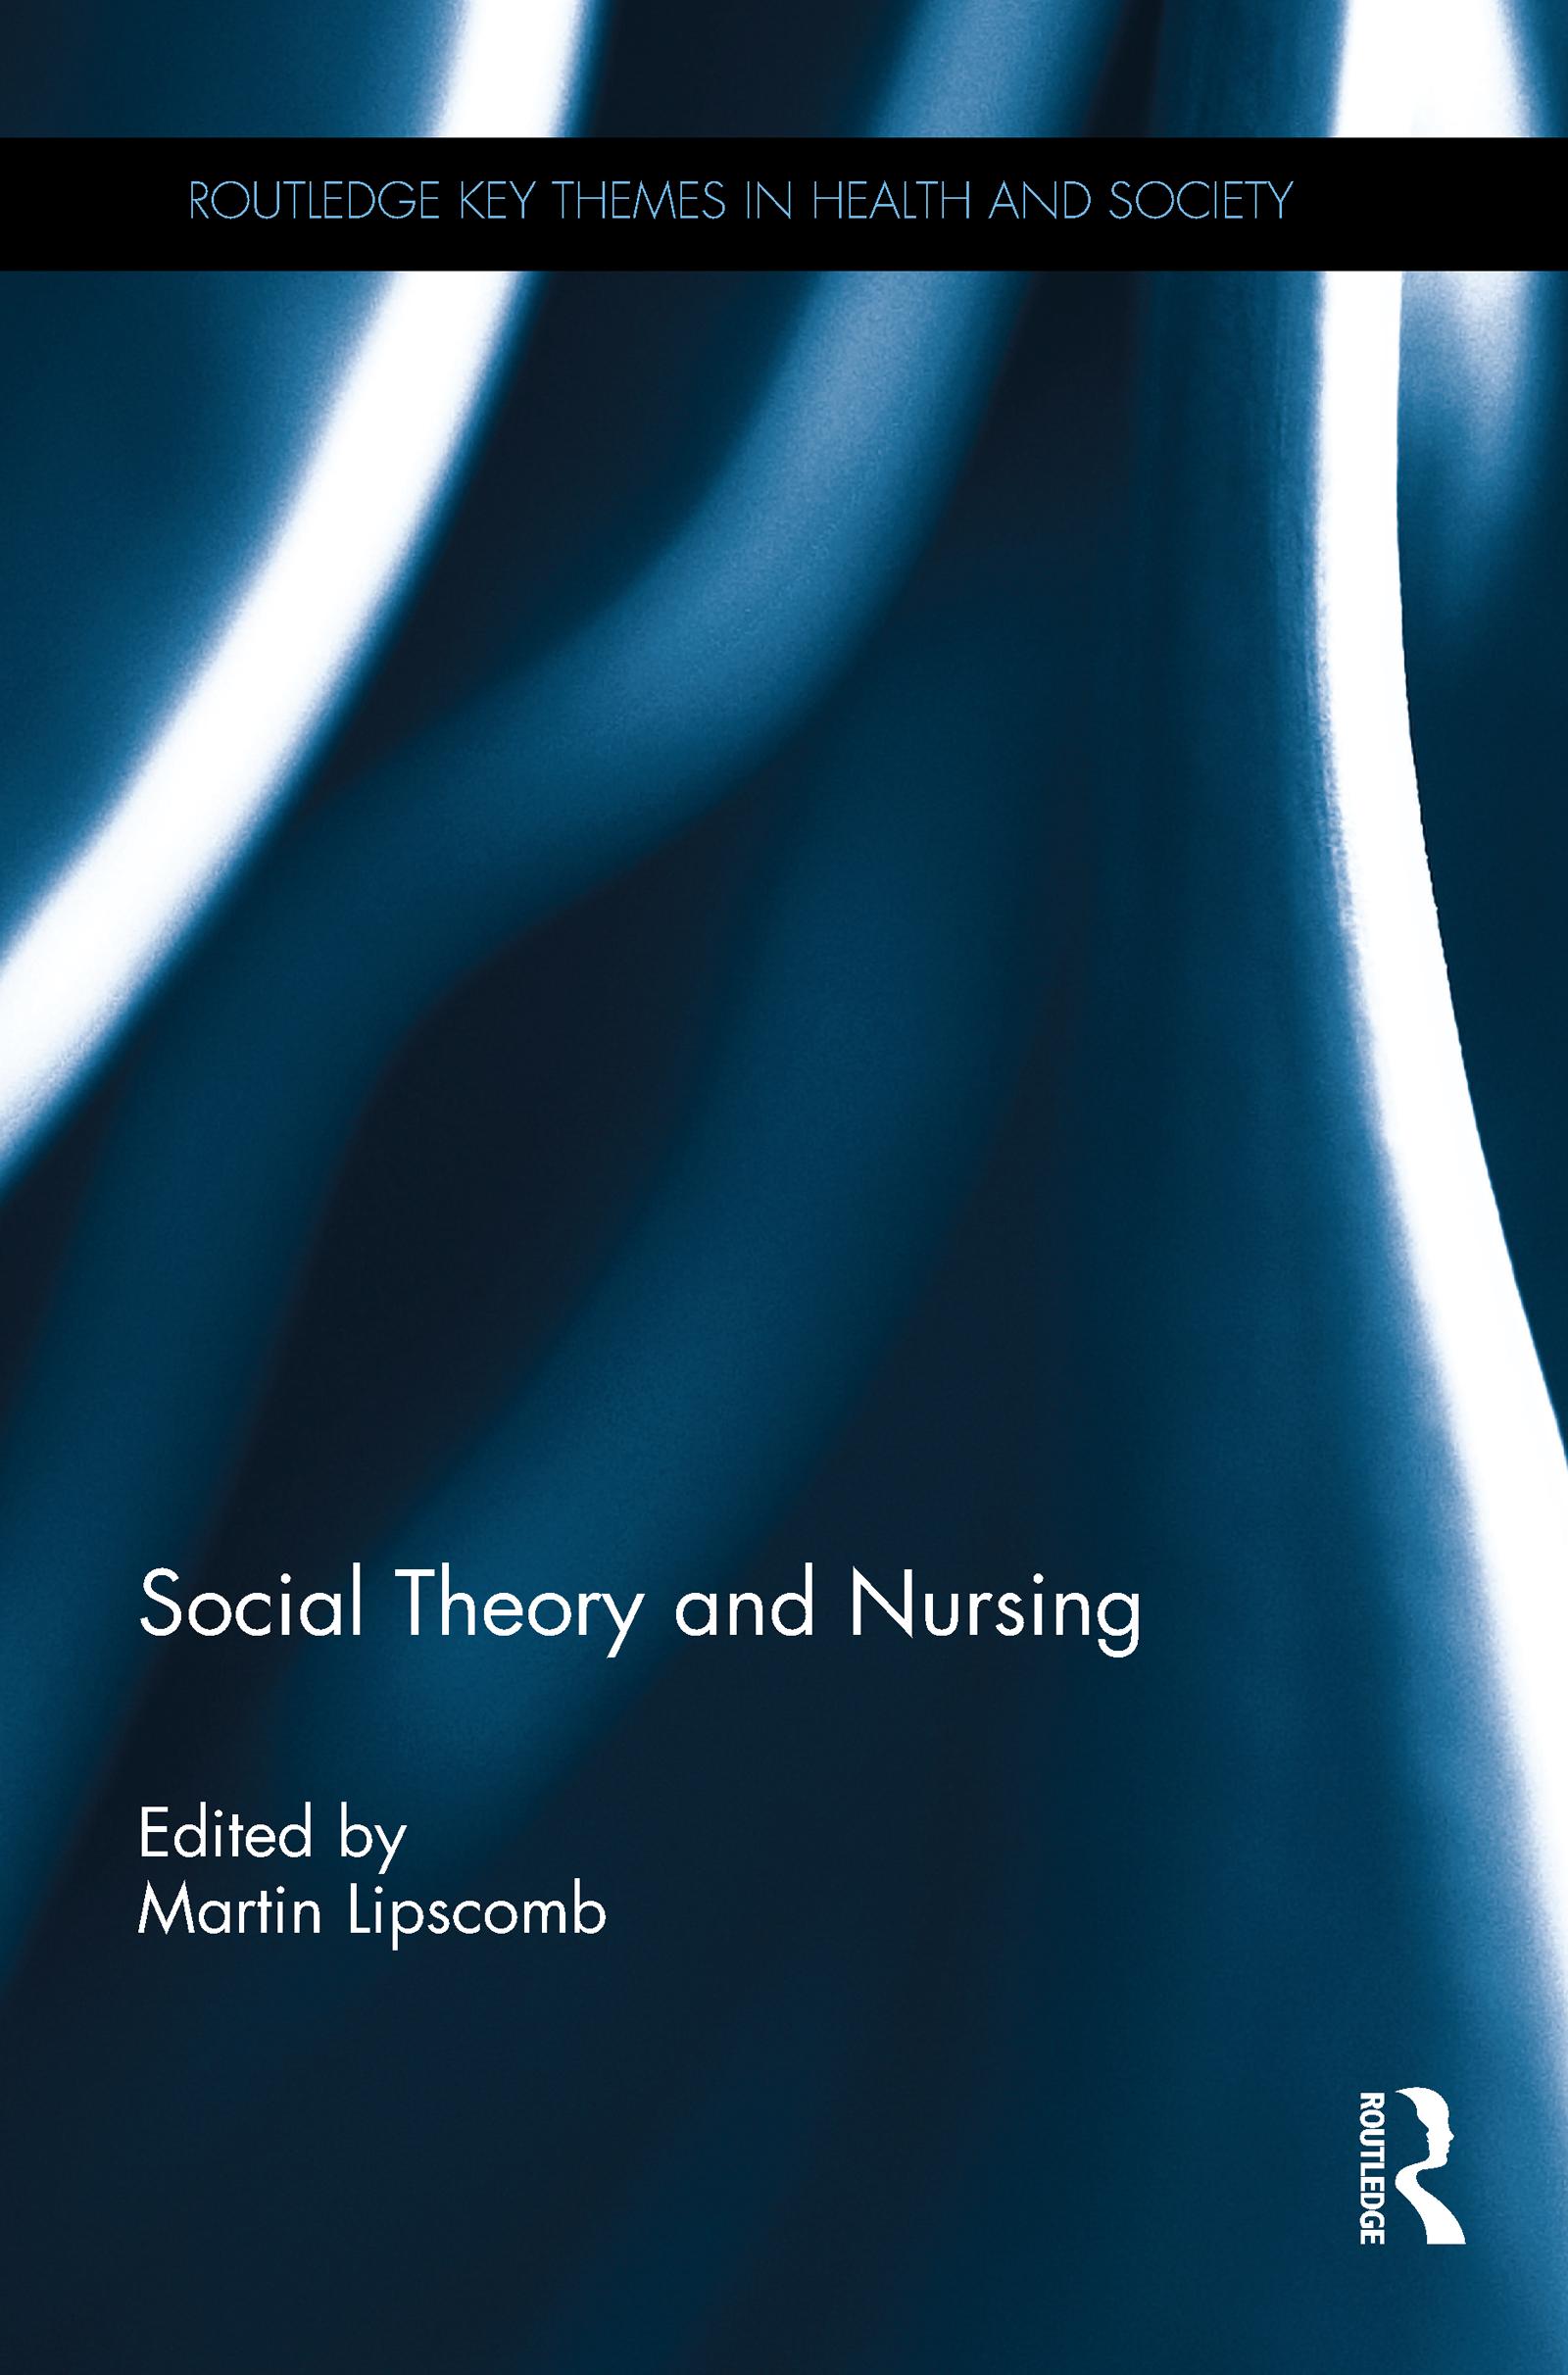 Social Theory and Nursing